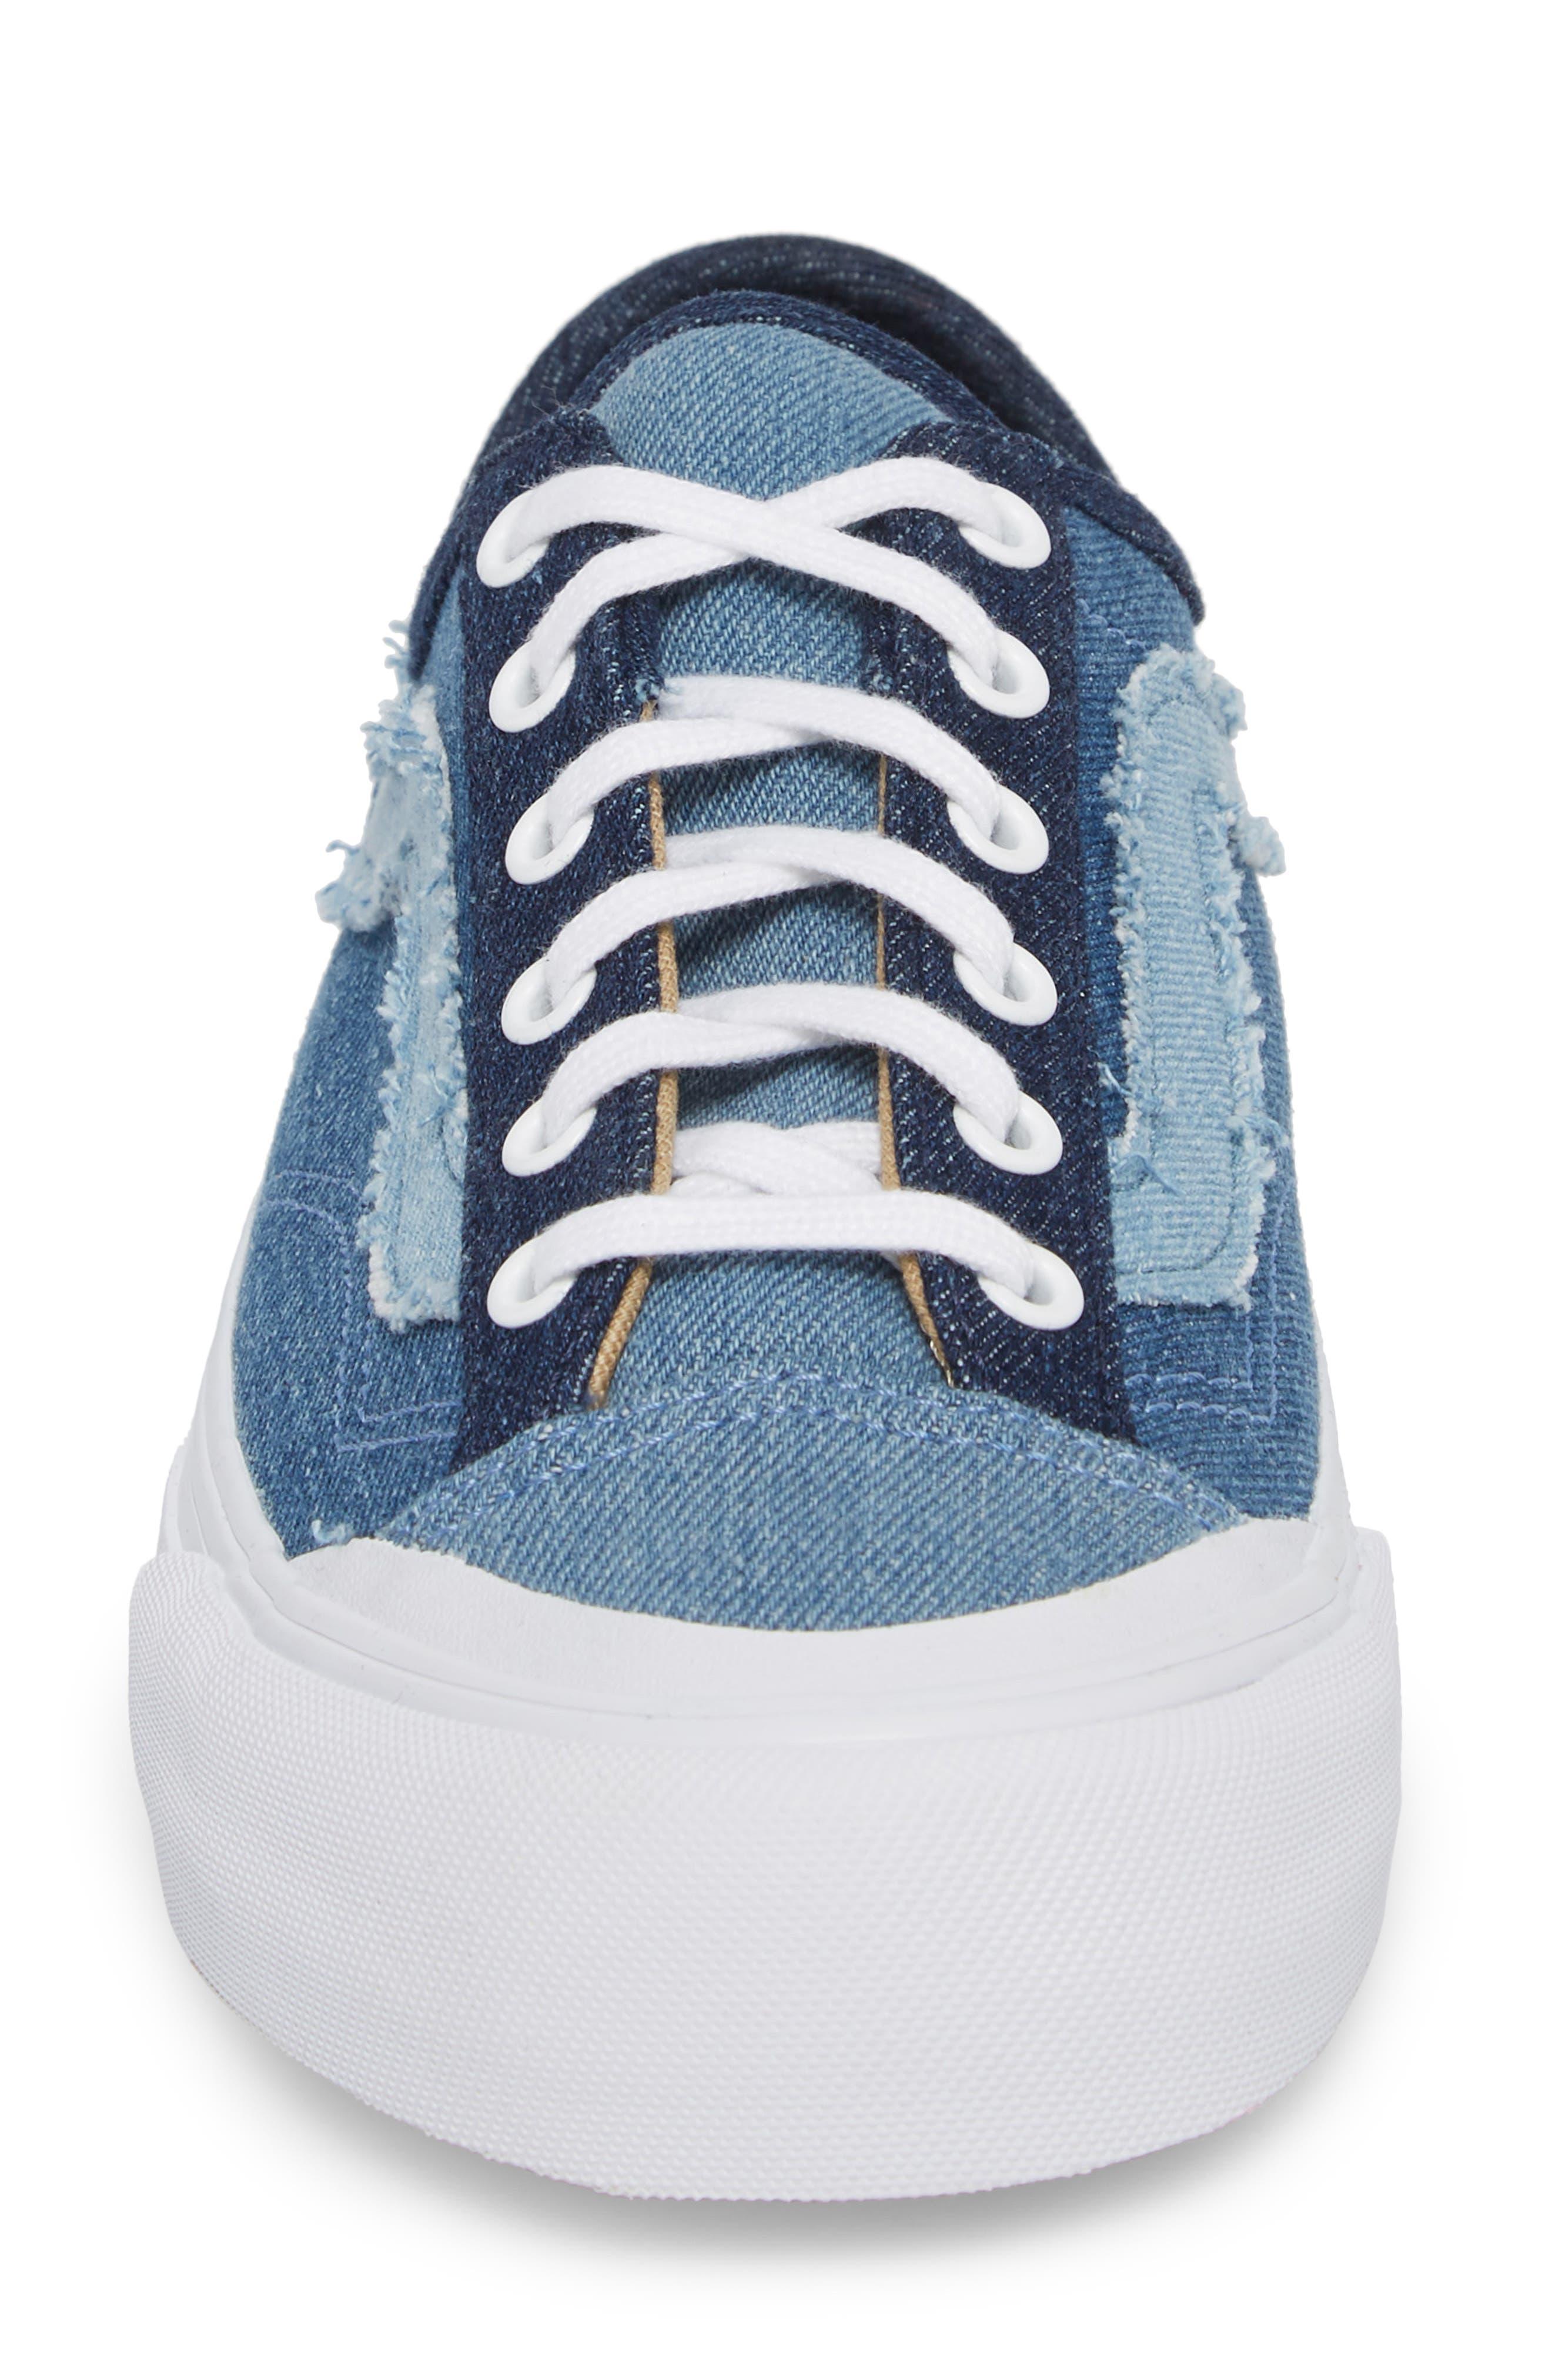 Style 36 Decon Sneaker,                             Alternate thumbnail 4, color,                             Frayed Denim